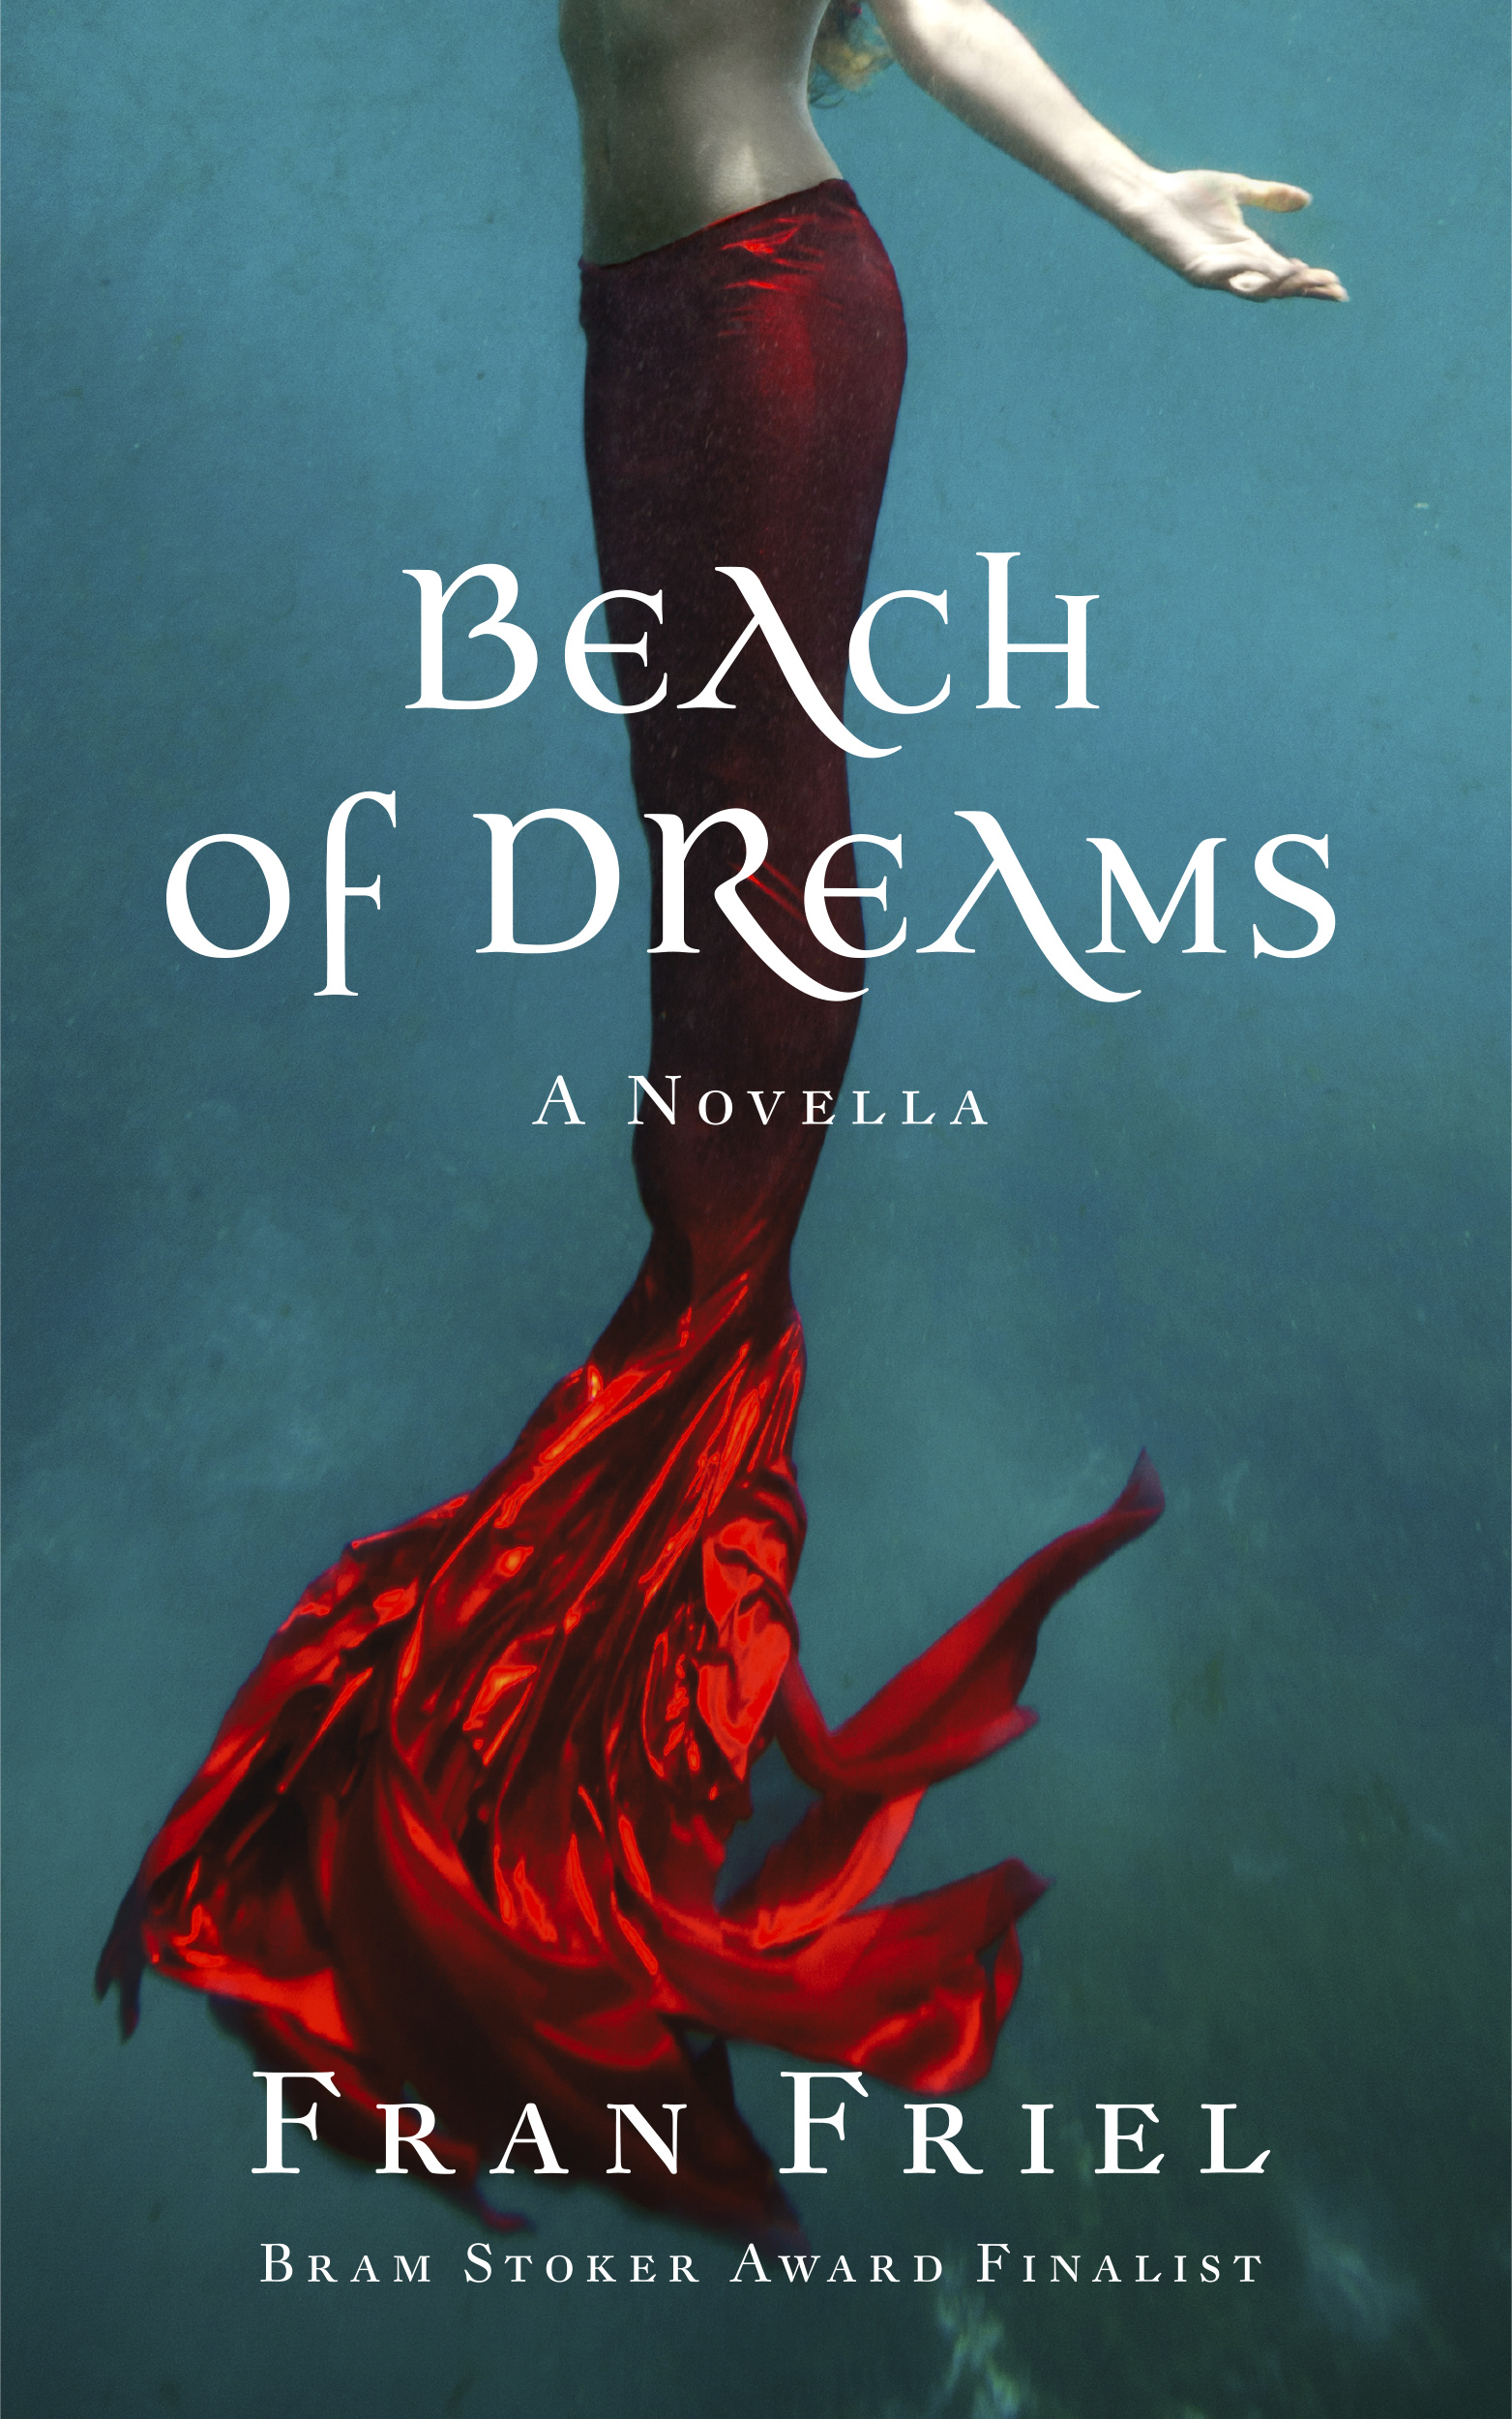 Beach of Dreams Version 2 - High Resolution.jpg